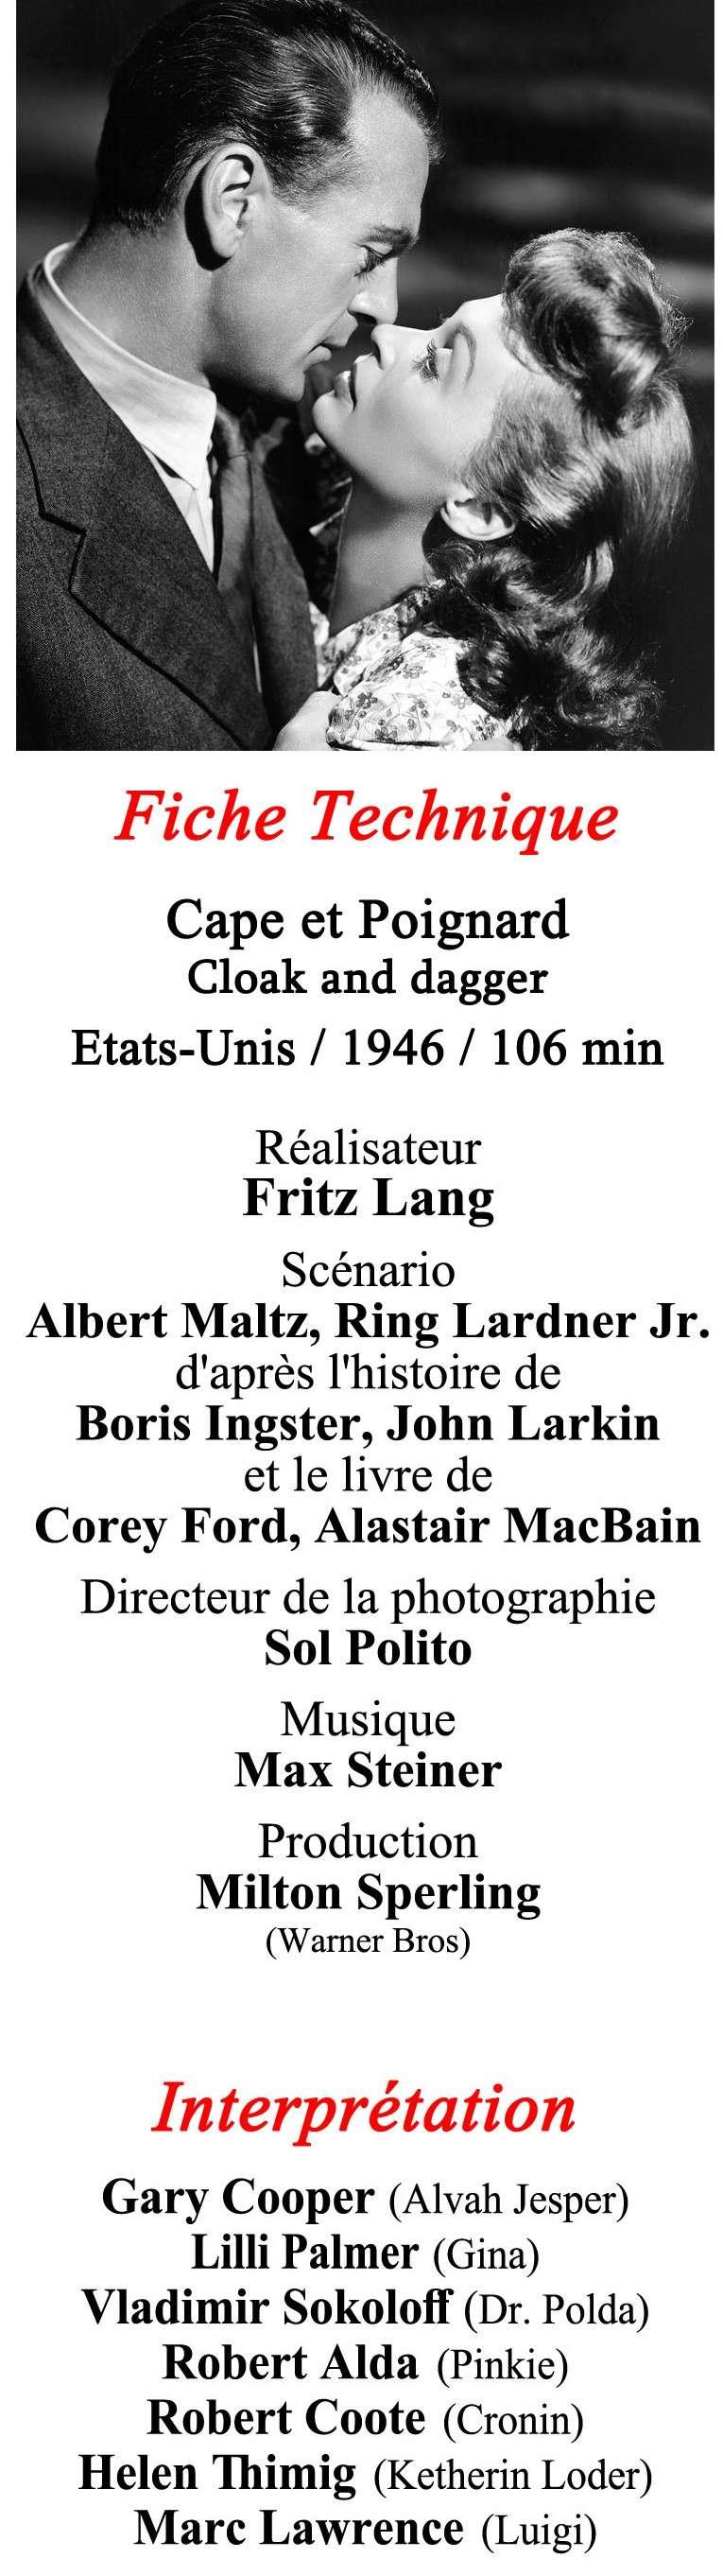 Cape et poignard. Cloak and Dagger. 1946. Fritz Lang. Verso-10